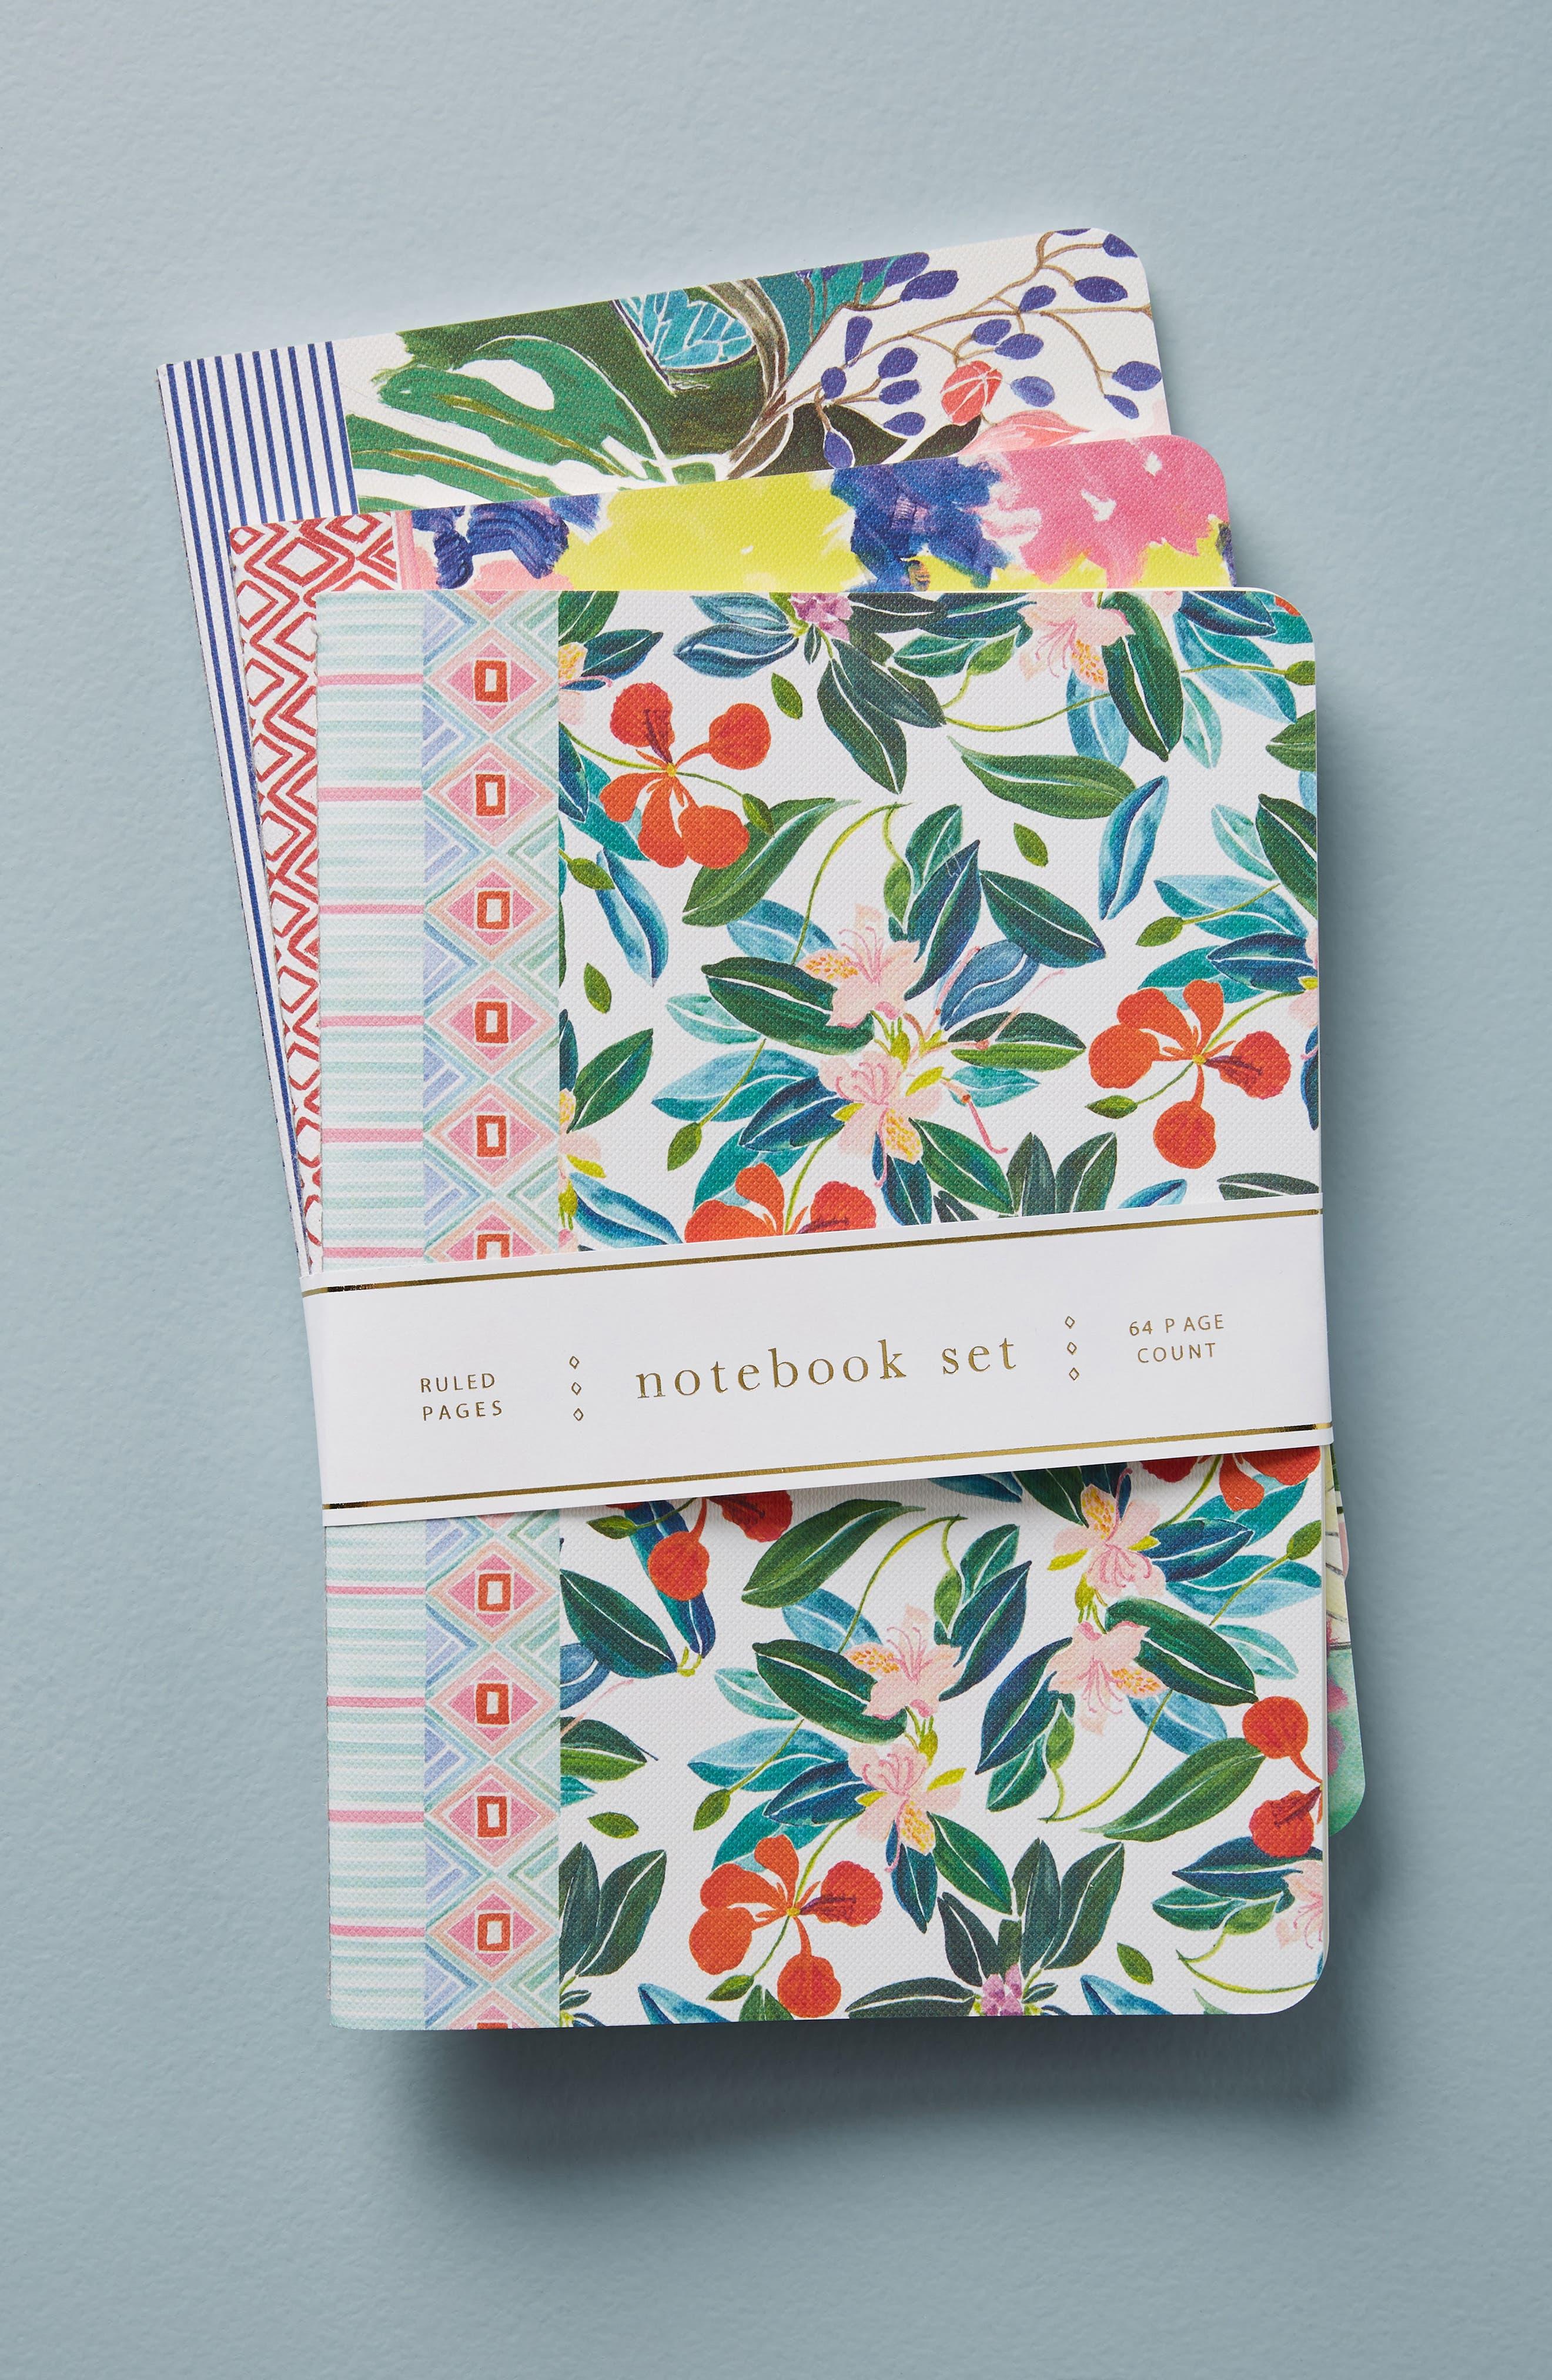 Sisters Gulassa Set of 3 Notebooks,                             Main thumbnail 1, color,                             311